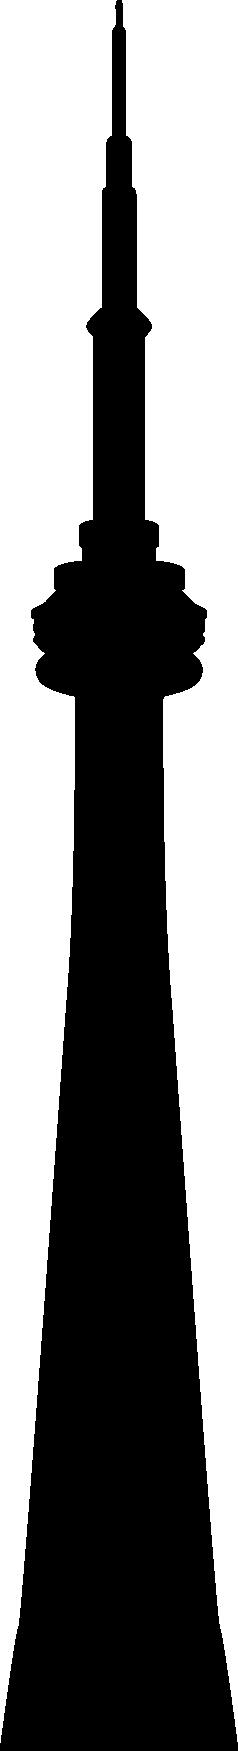 238x1751 Cn Tower Vector Silhouette By Syaofkanada